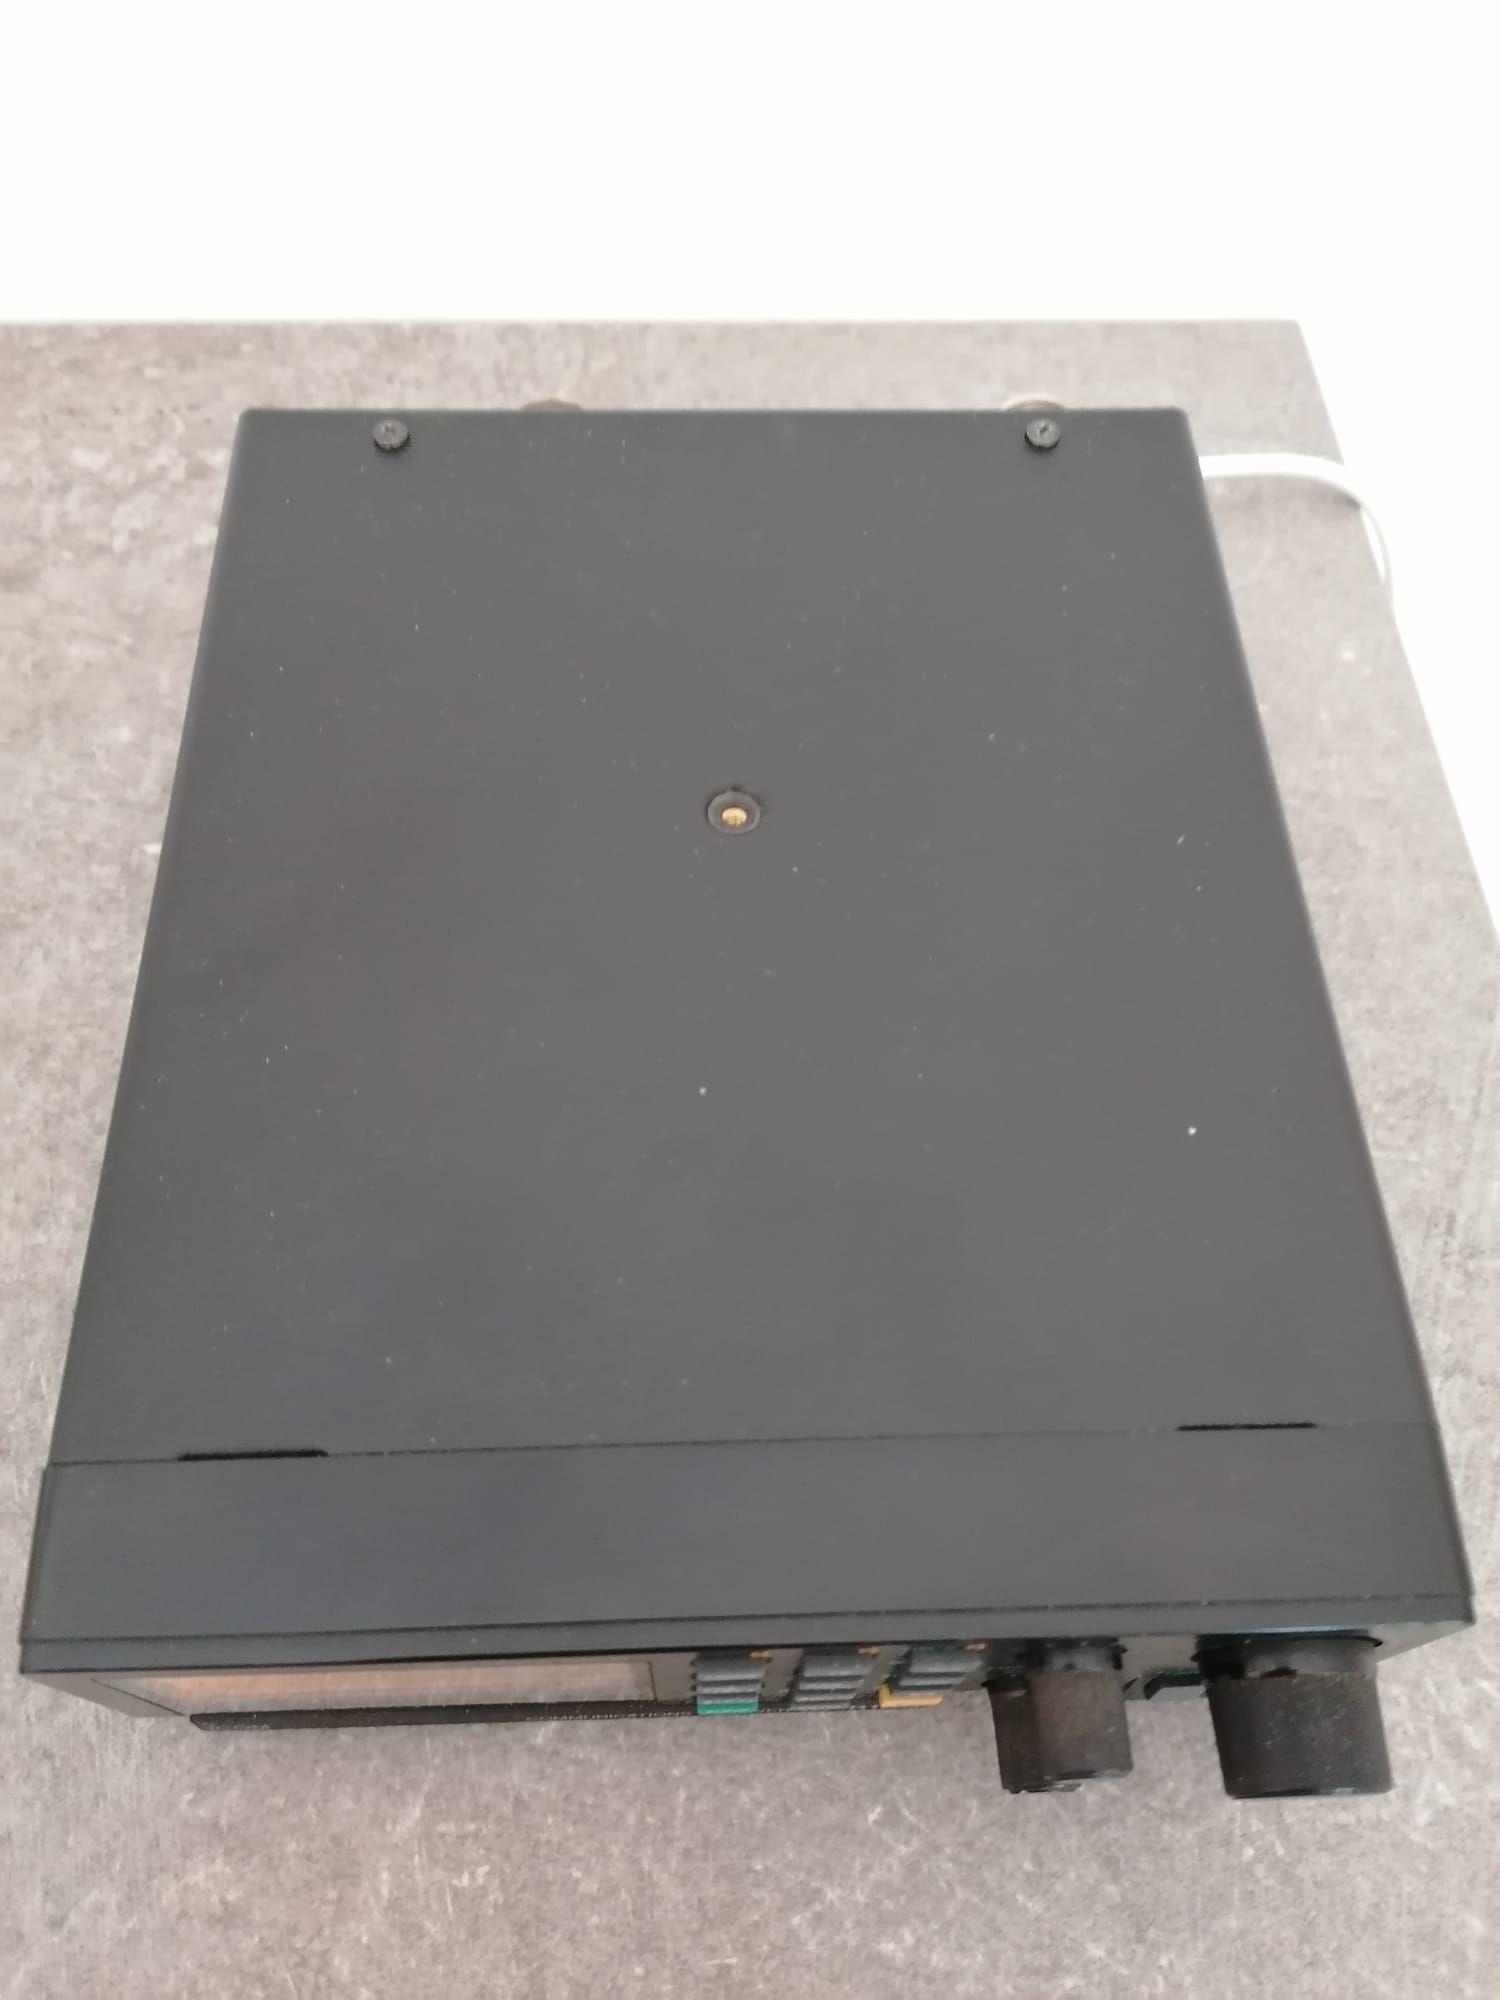 Icom ic r100 rarissimo con scheda SSB USB LSB